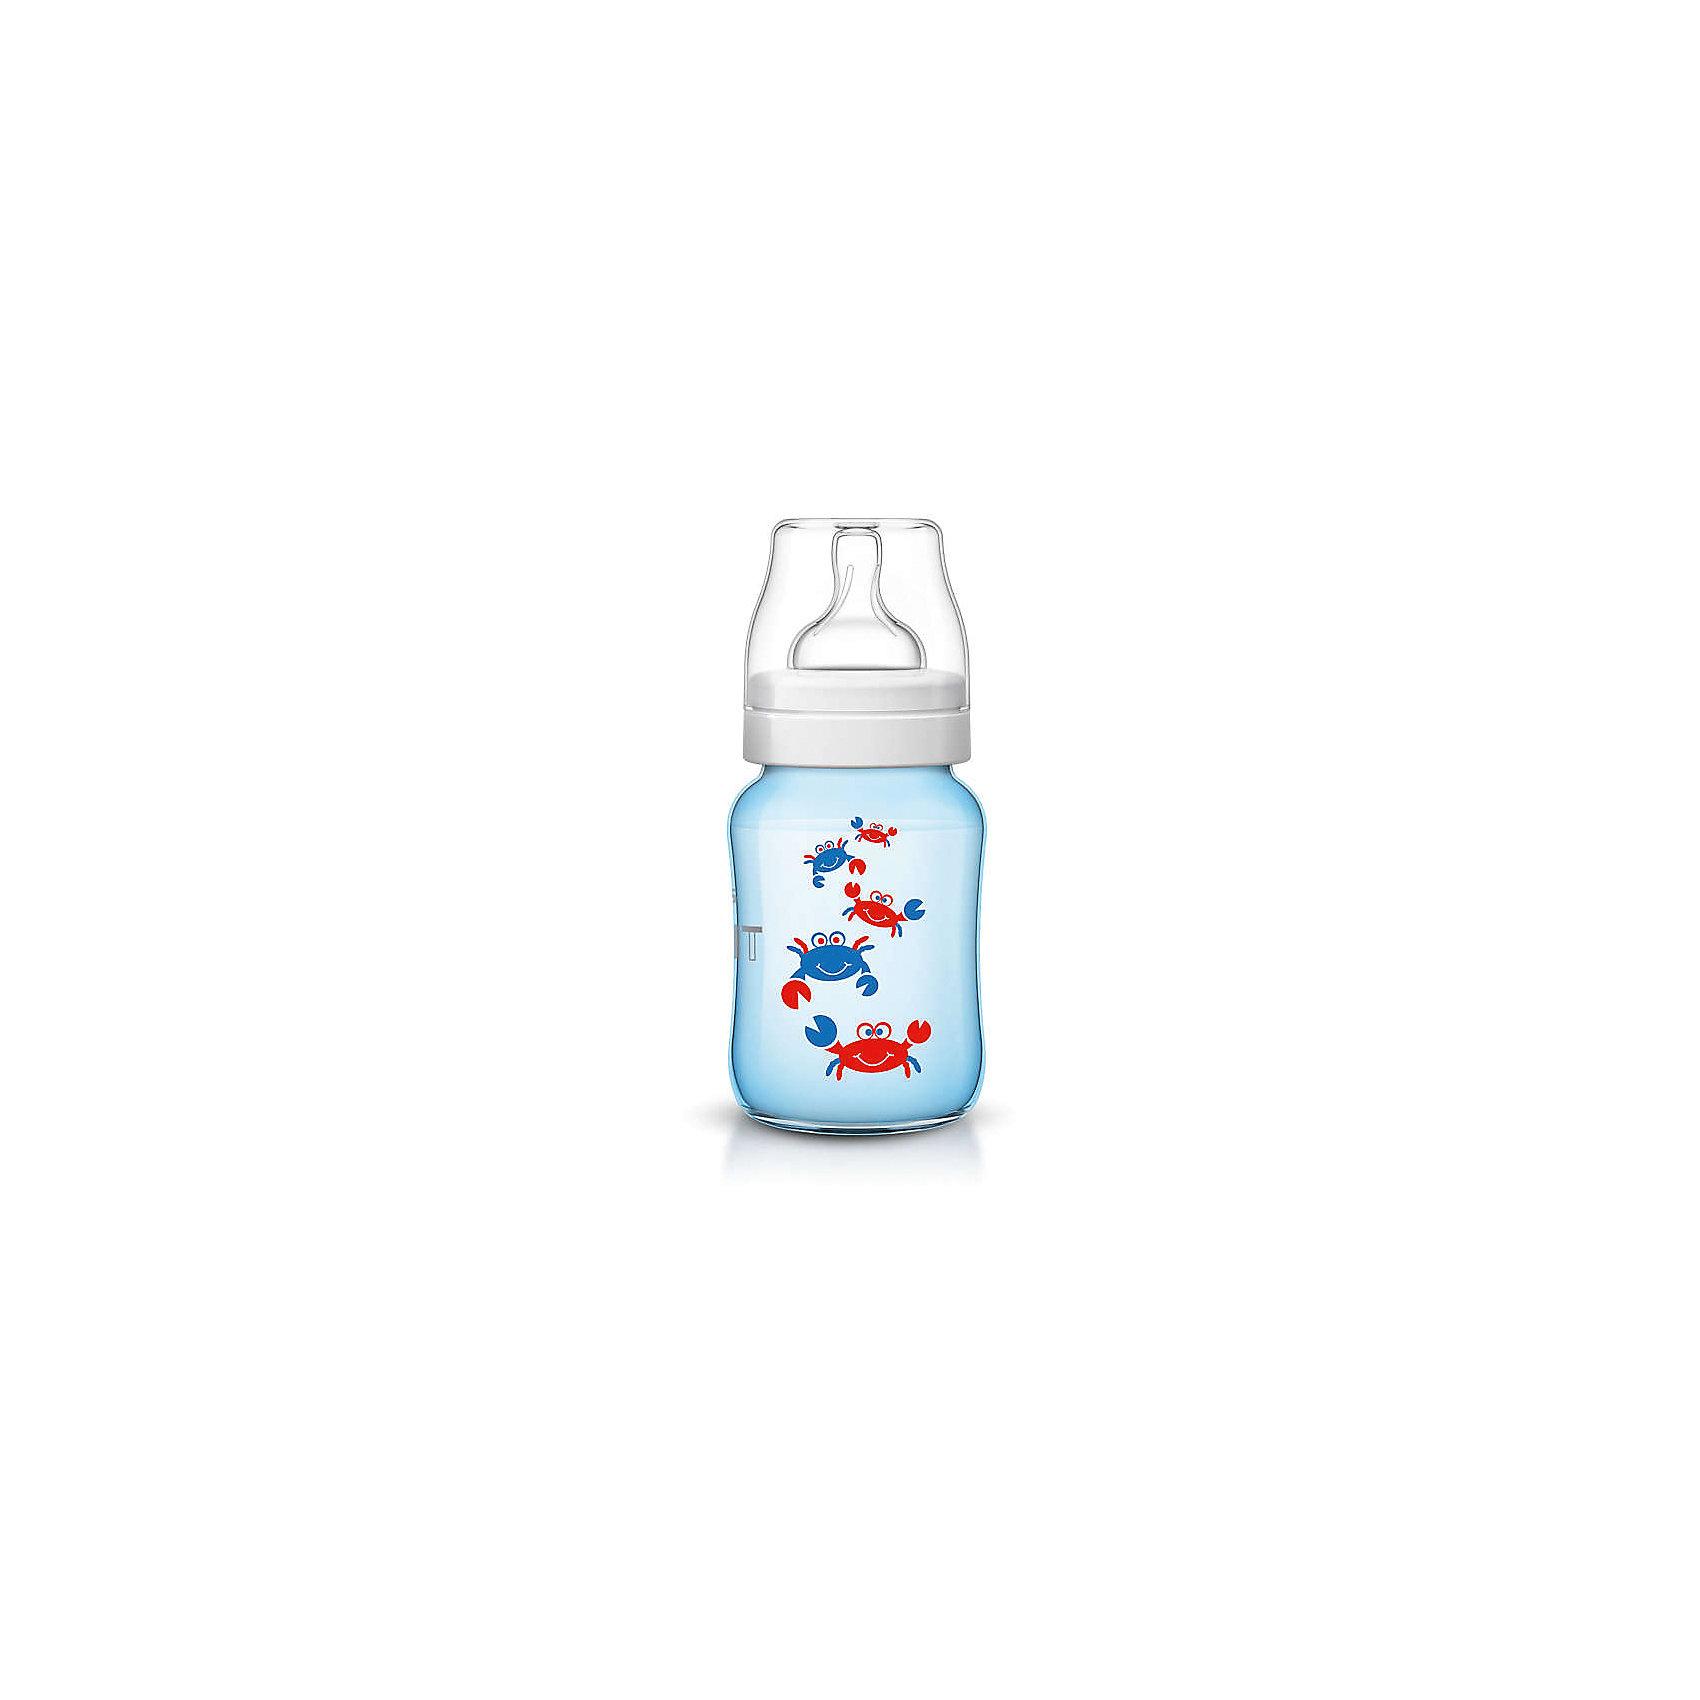 PHILIPS AVENT Бутылочка для кормления Крабы 260мл, Avent